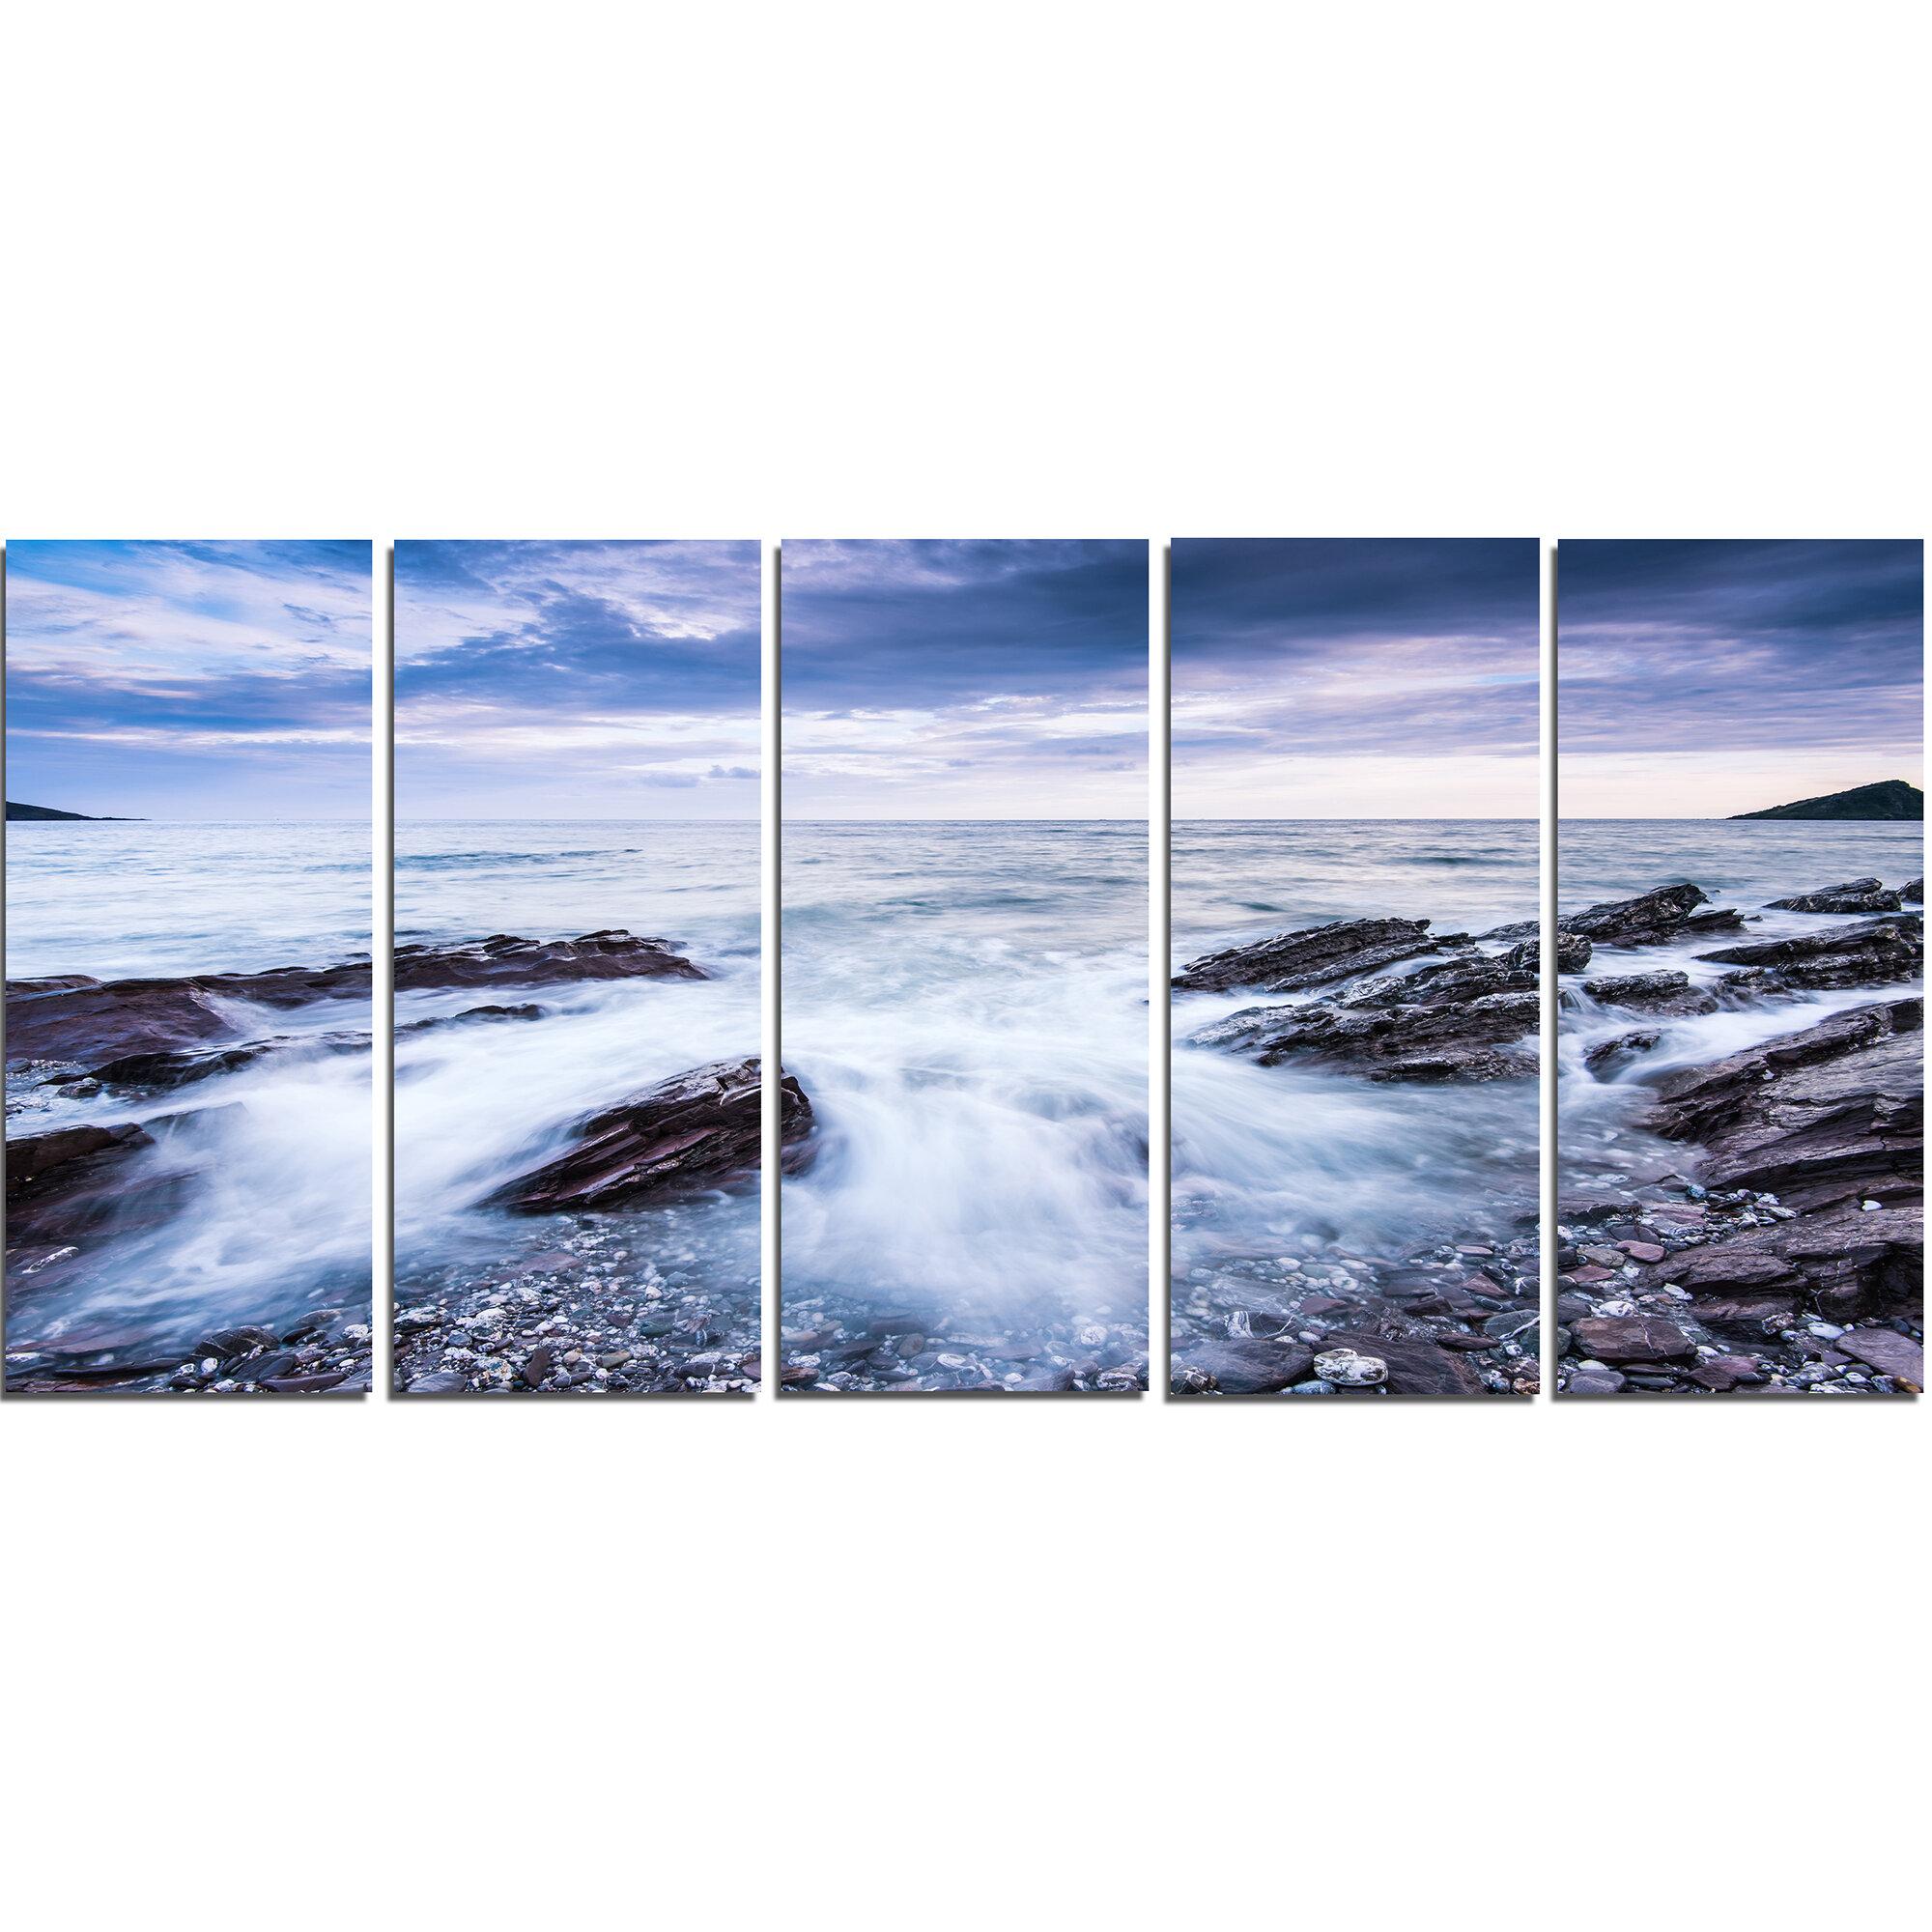 Gift Wave Crashing Beach Decor ~ Vivid Mouse Pad Nature ~ Ocean Water